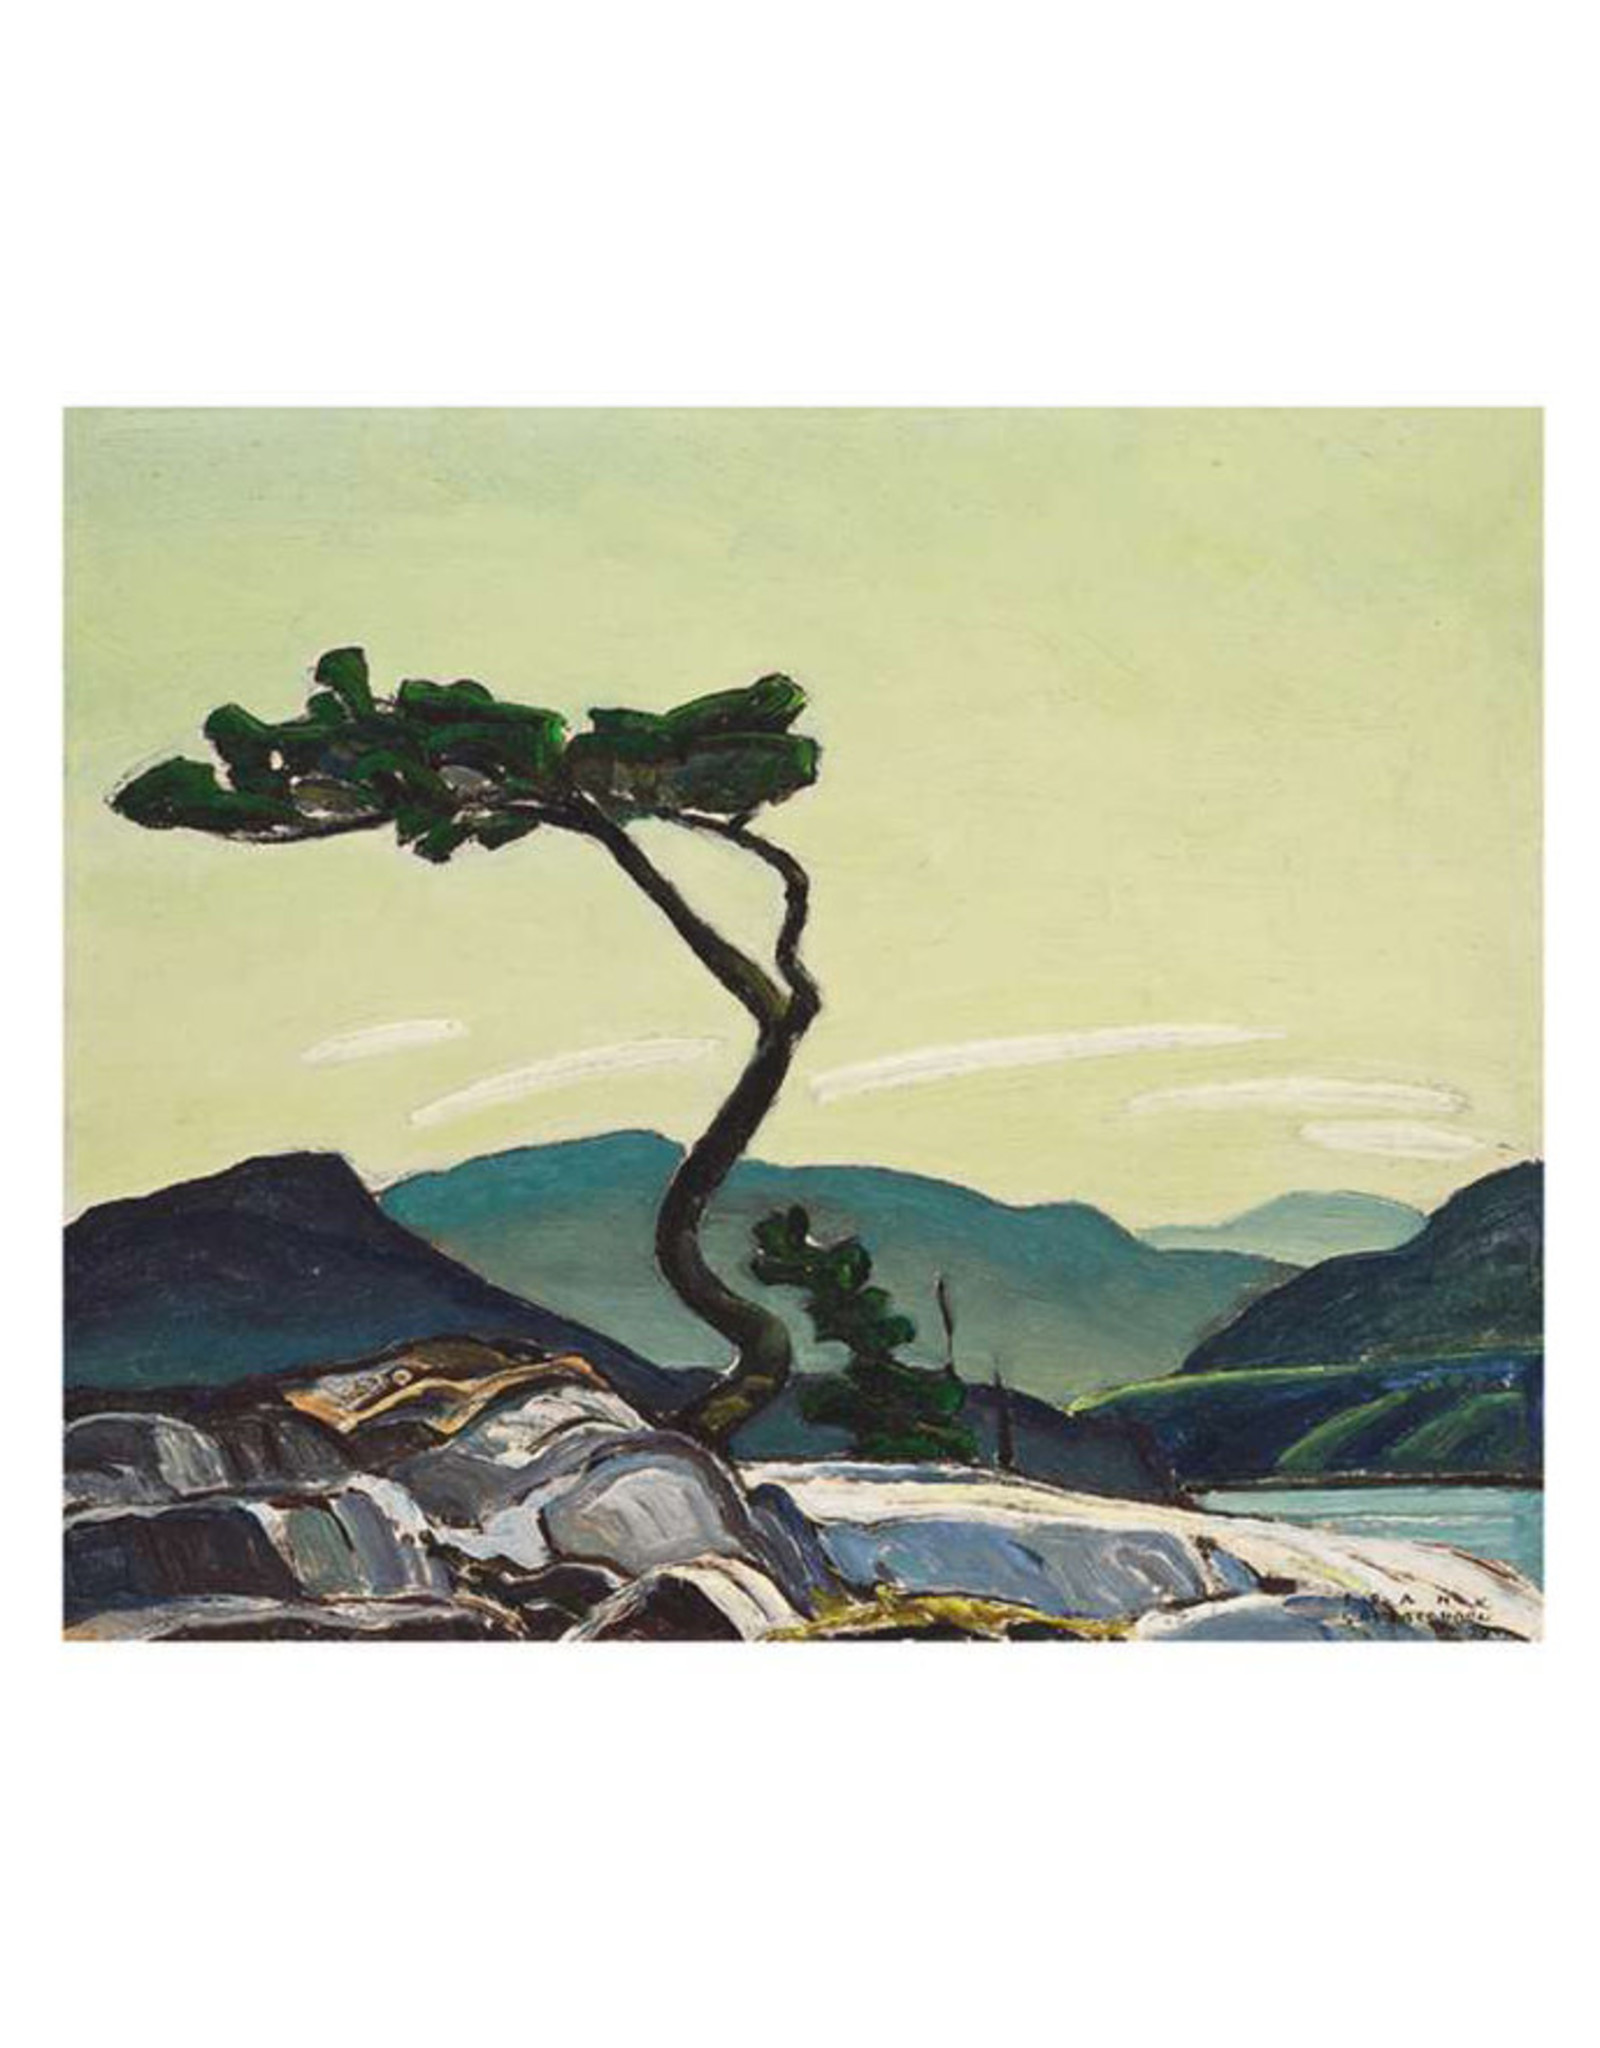 Pomegranate Franklin Carmichael: Twisted Pine Postcard